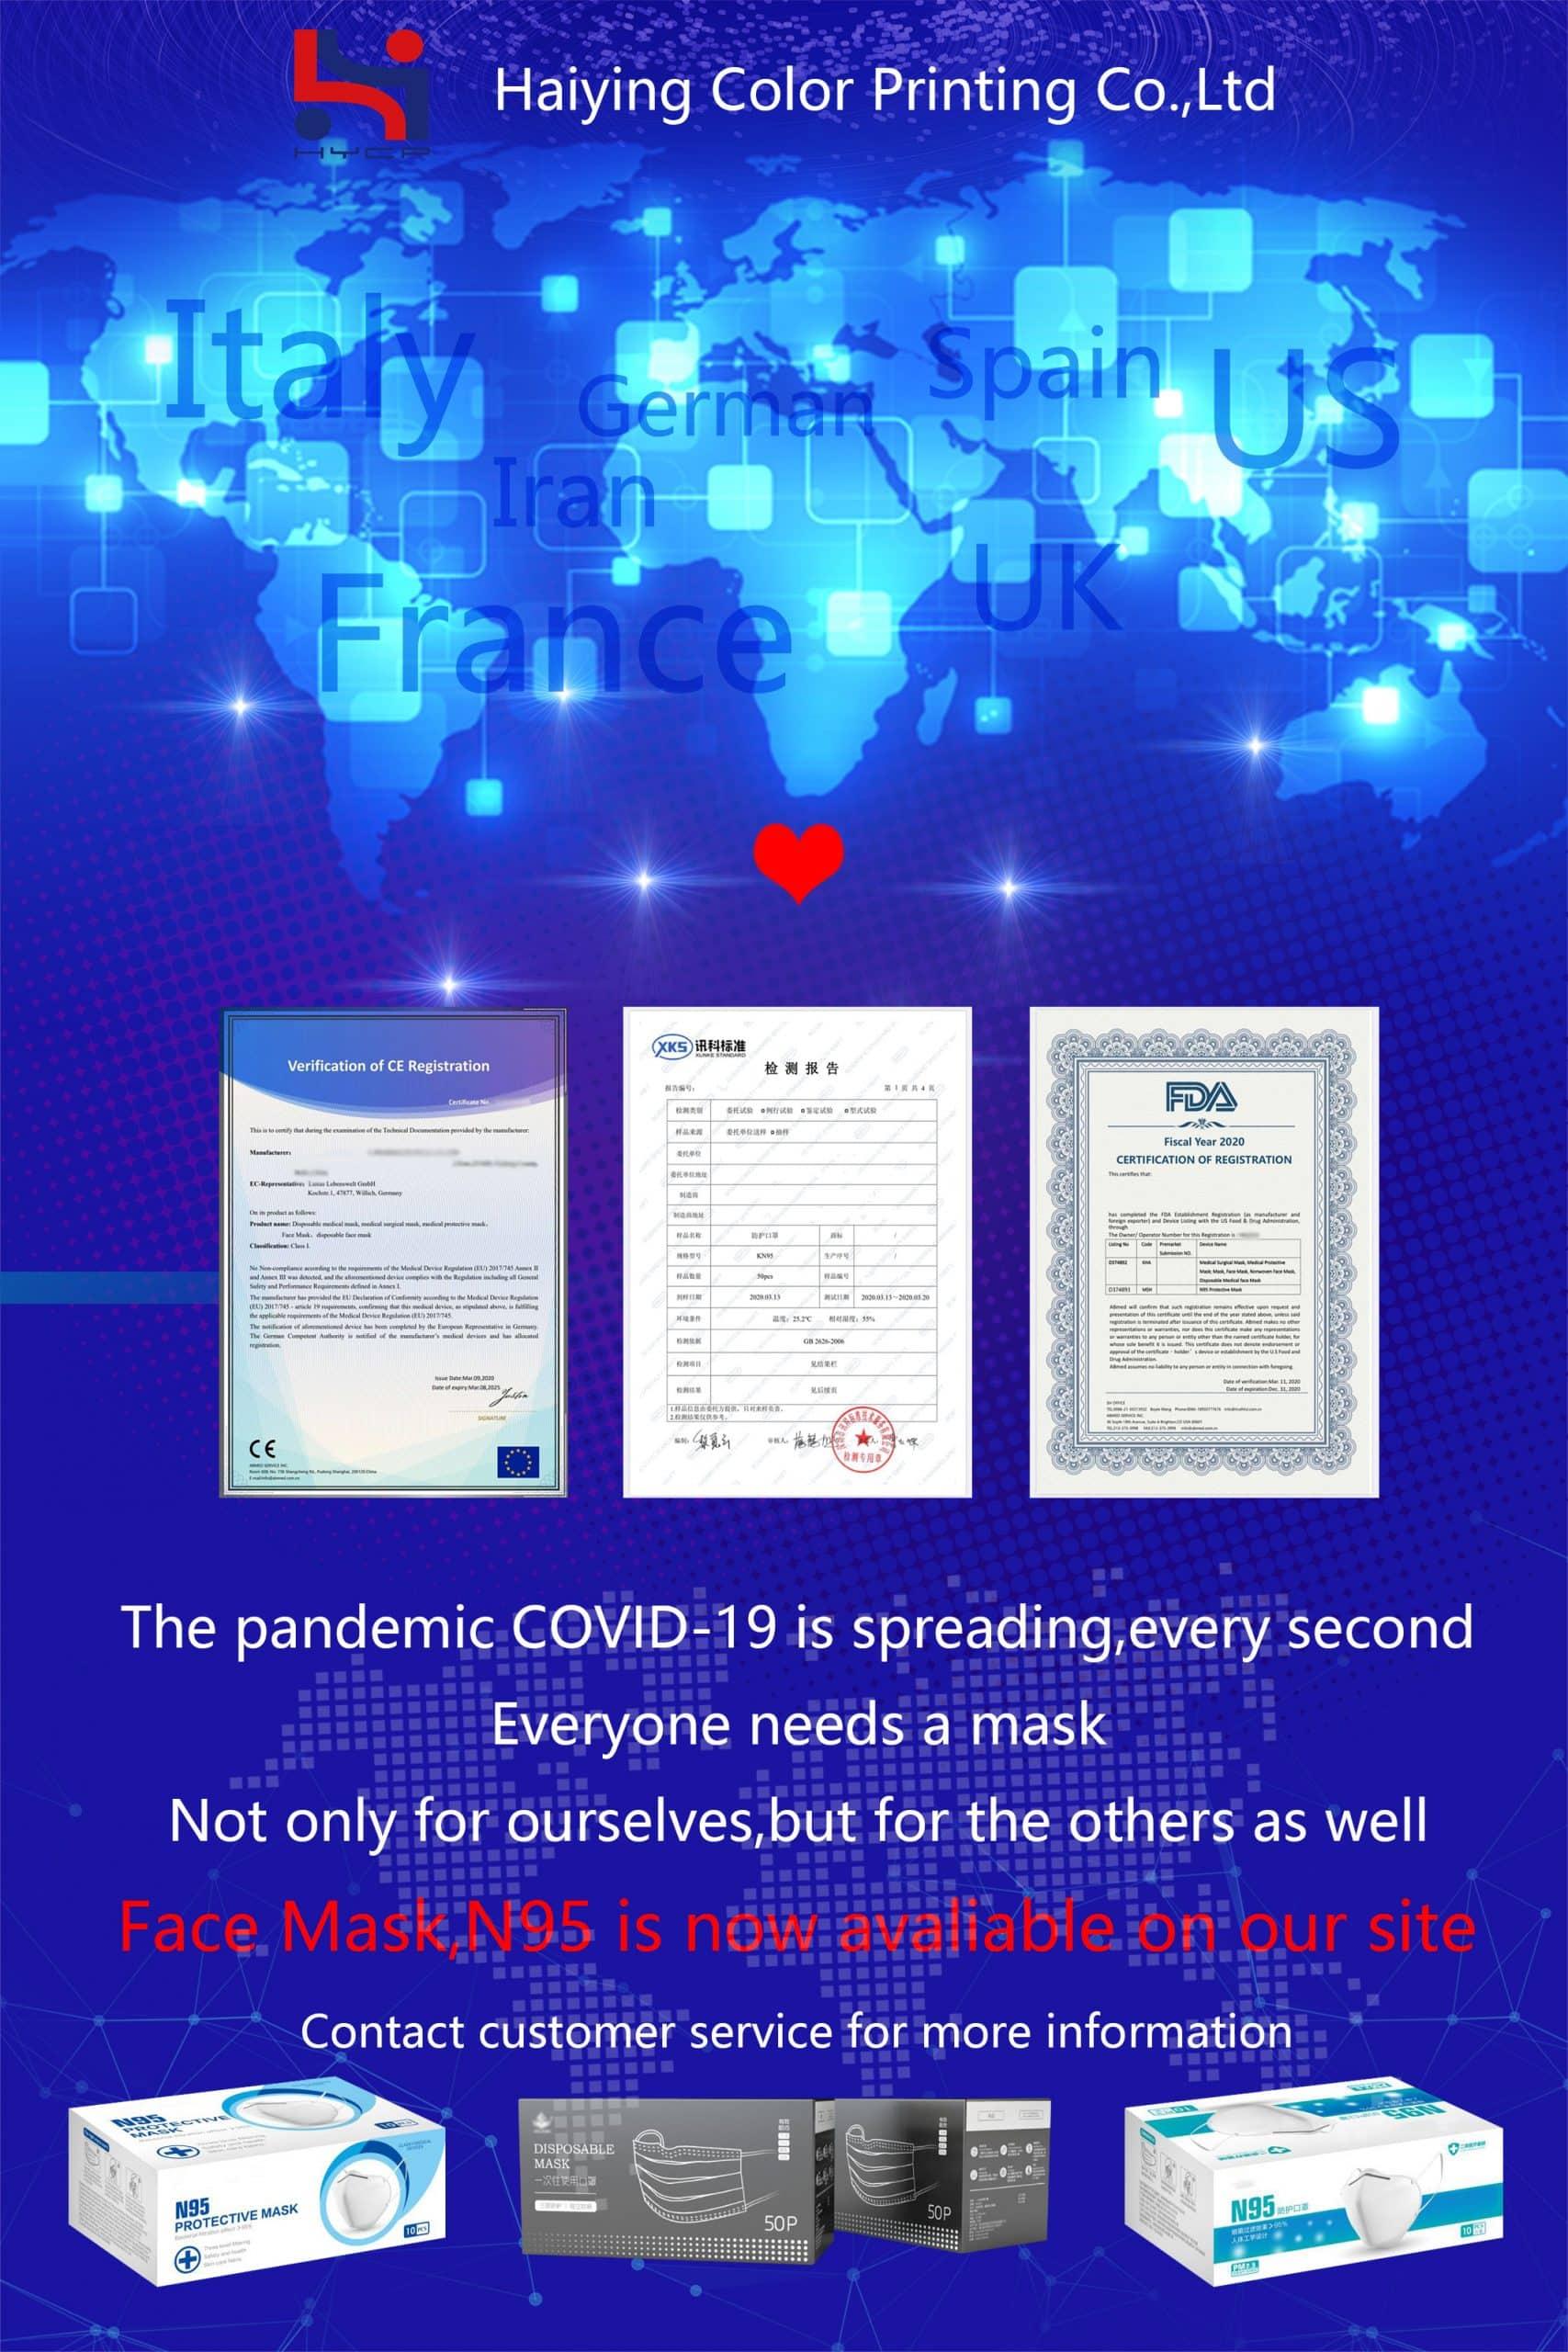 corona virus, COVID-19